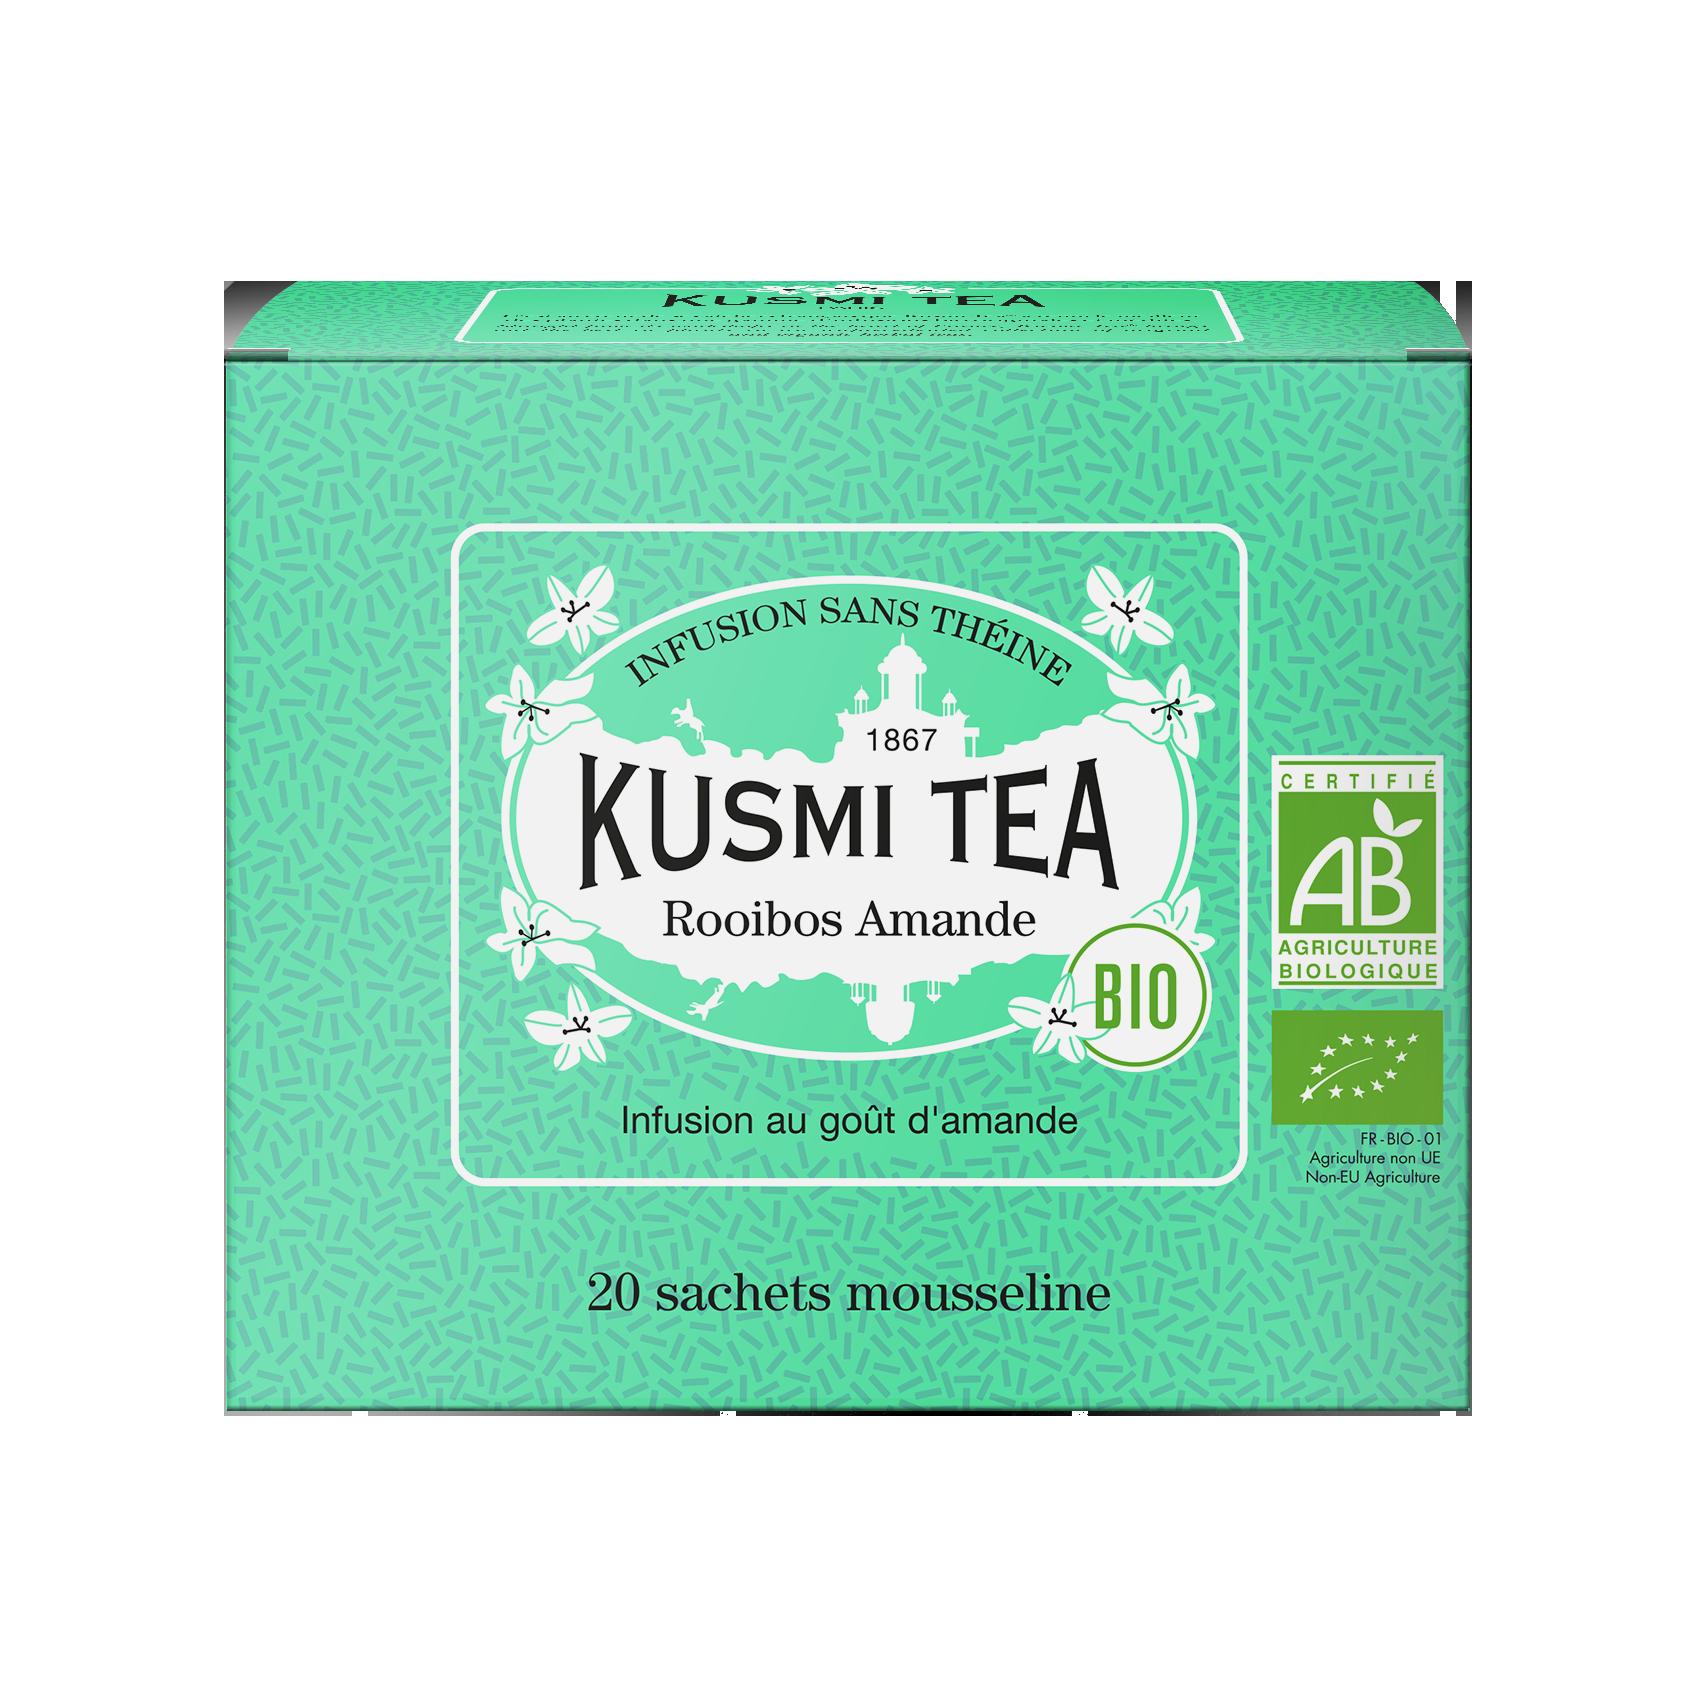 Infusion de rooibos bio - Rooibos Amande (Infusion bio) - Sachets - Kusmi Tea